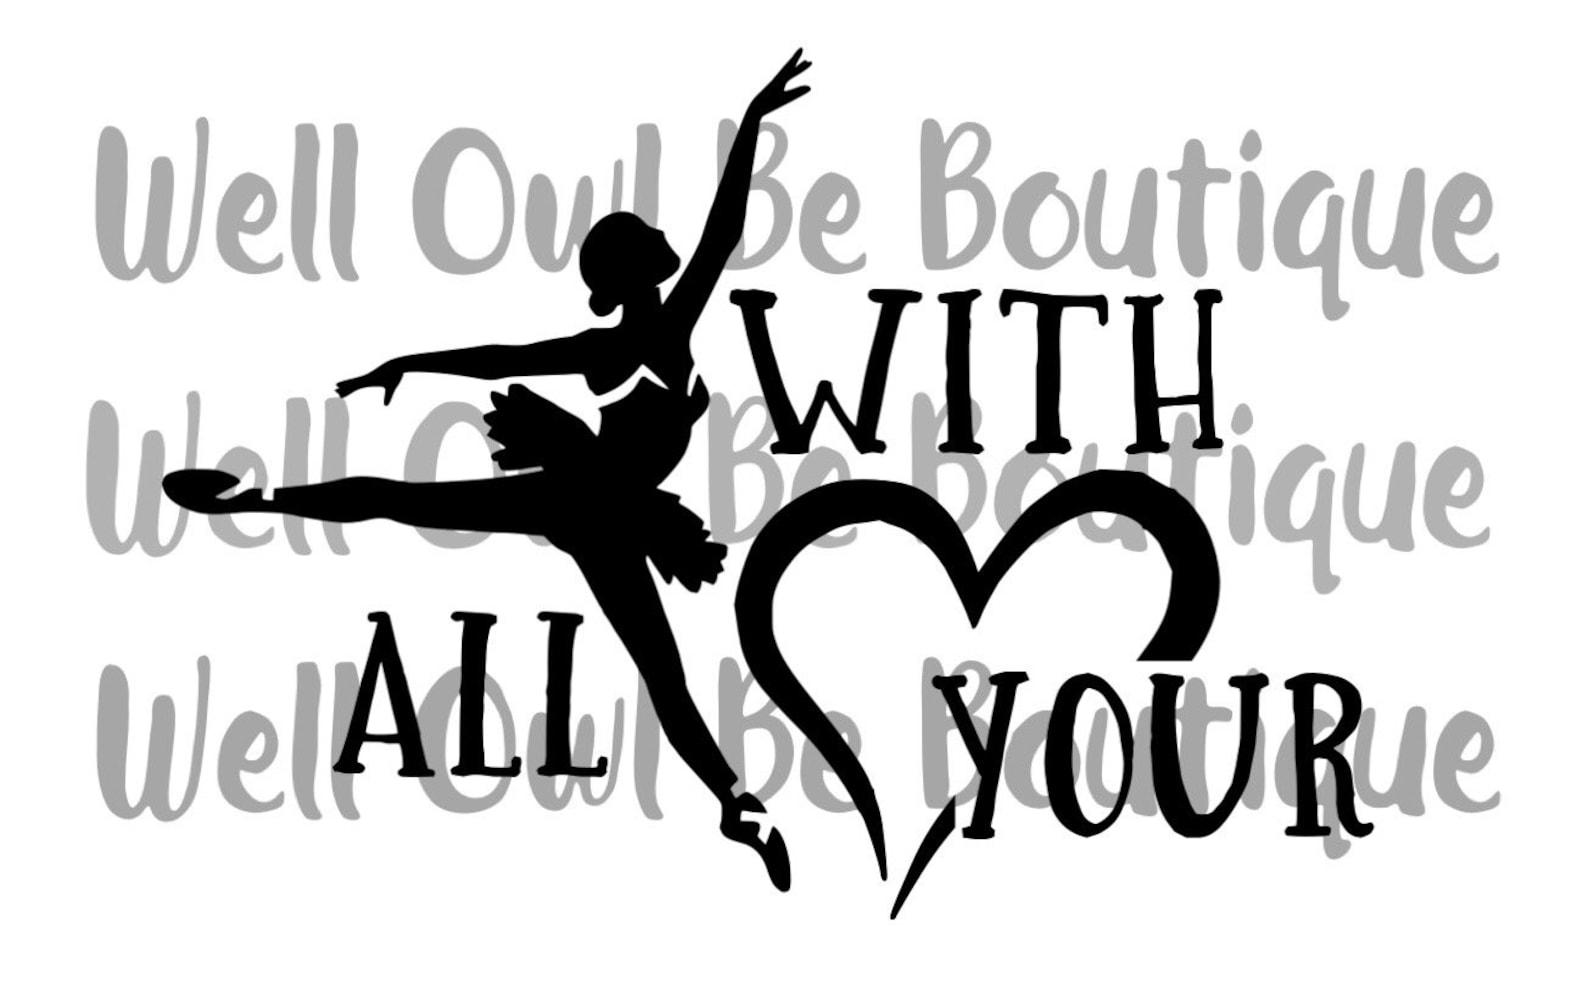 dance with all your heart|dance svg|ballet svg|dancing svg|ballet dancer svg|heart svg|dance|ballet|svg